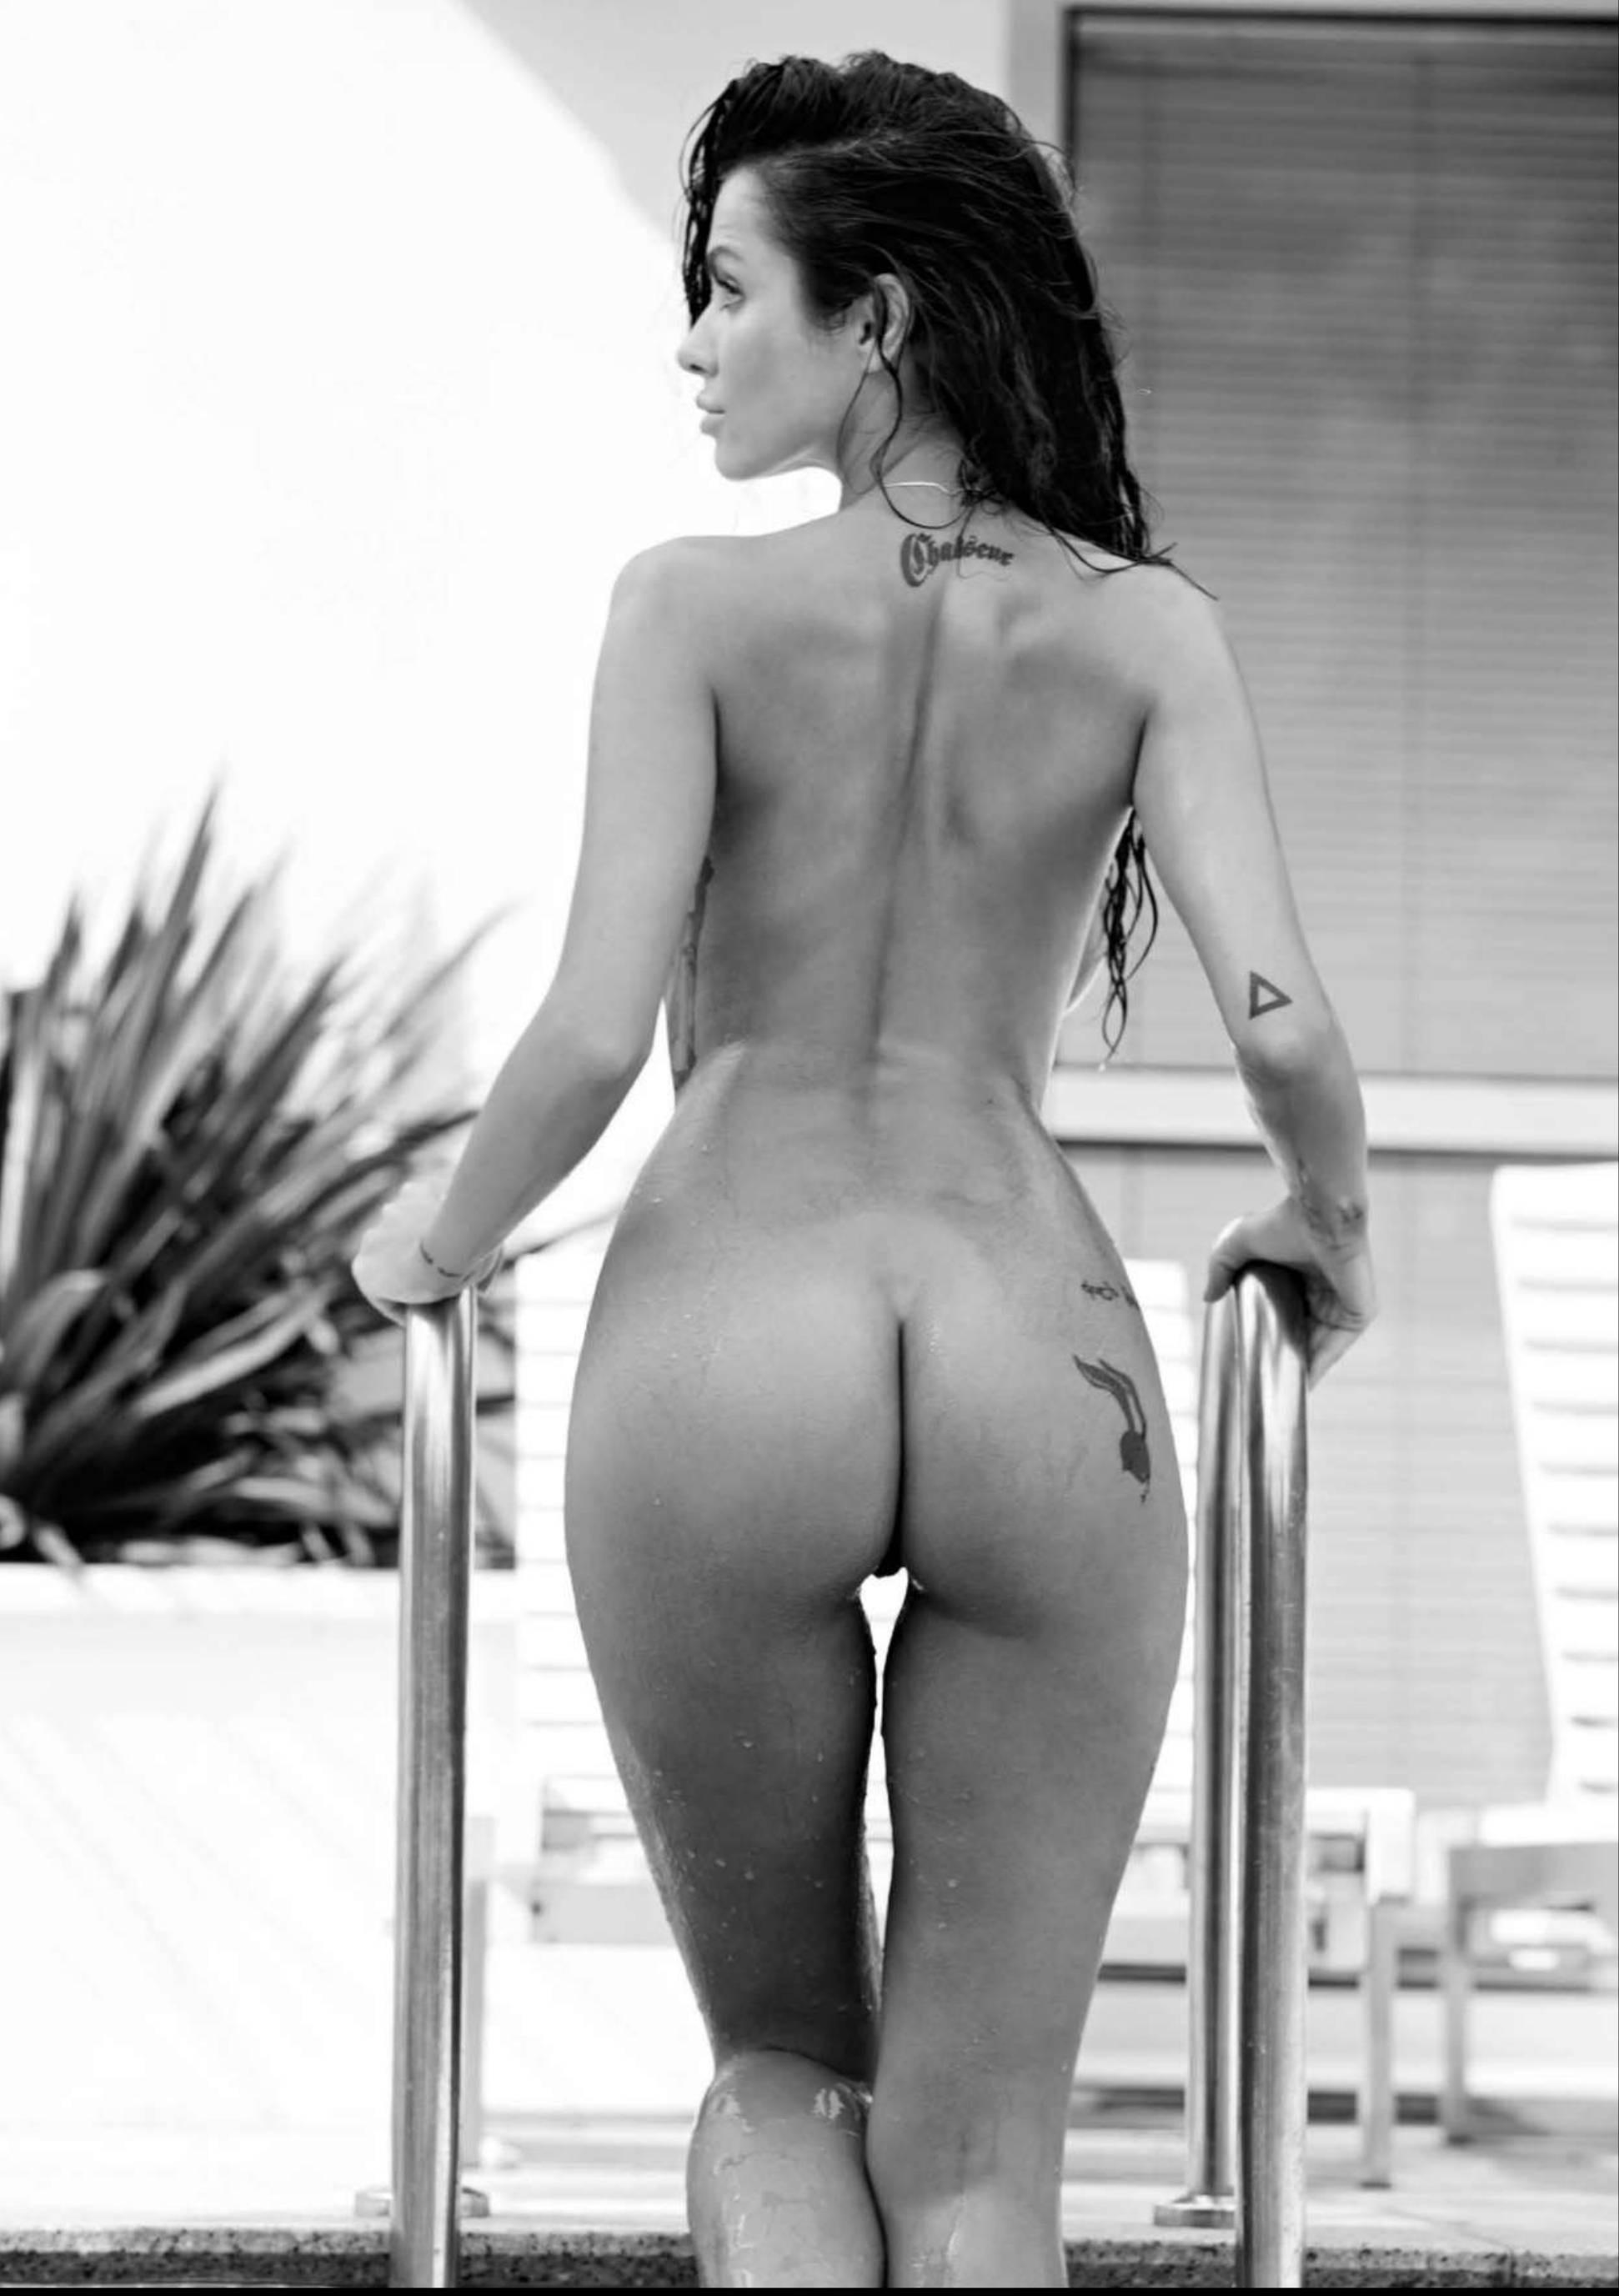 fotos de Natalia Siwiec sin ropa interior